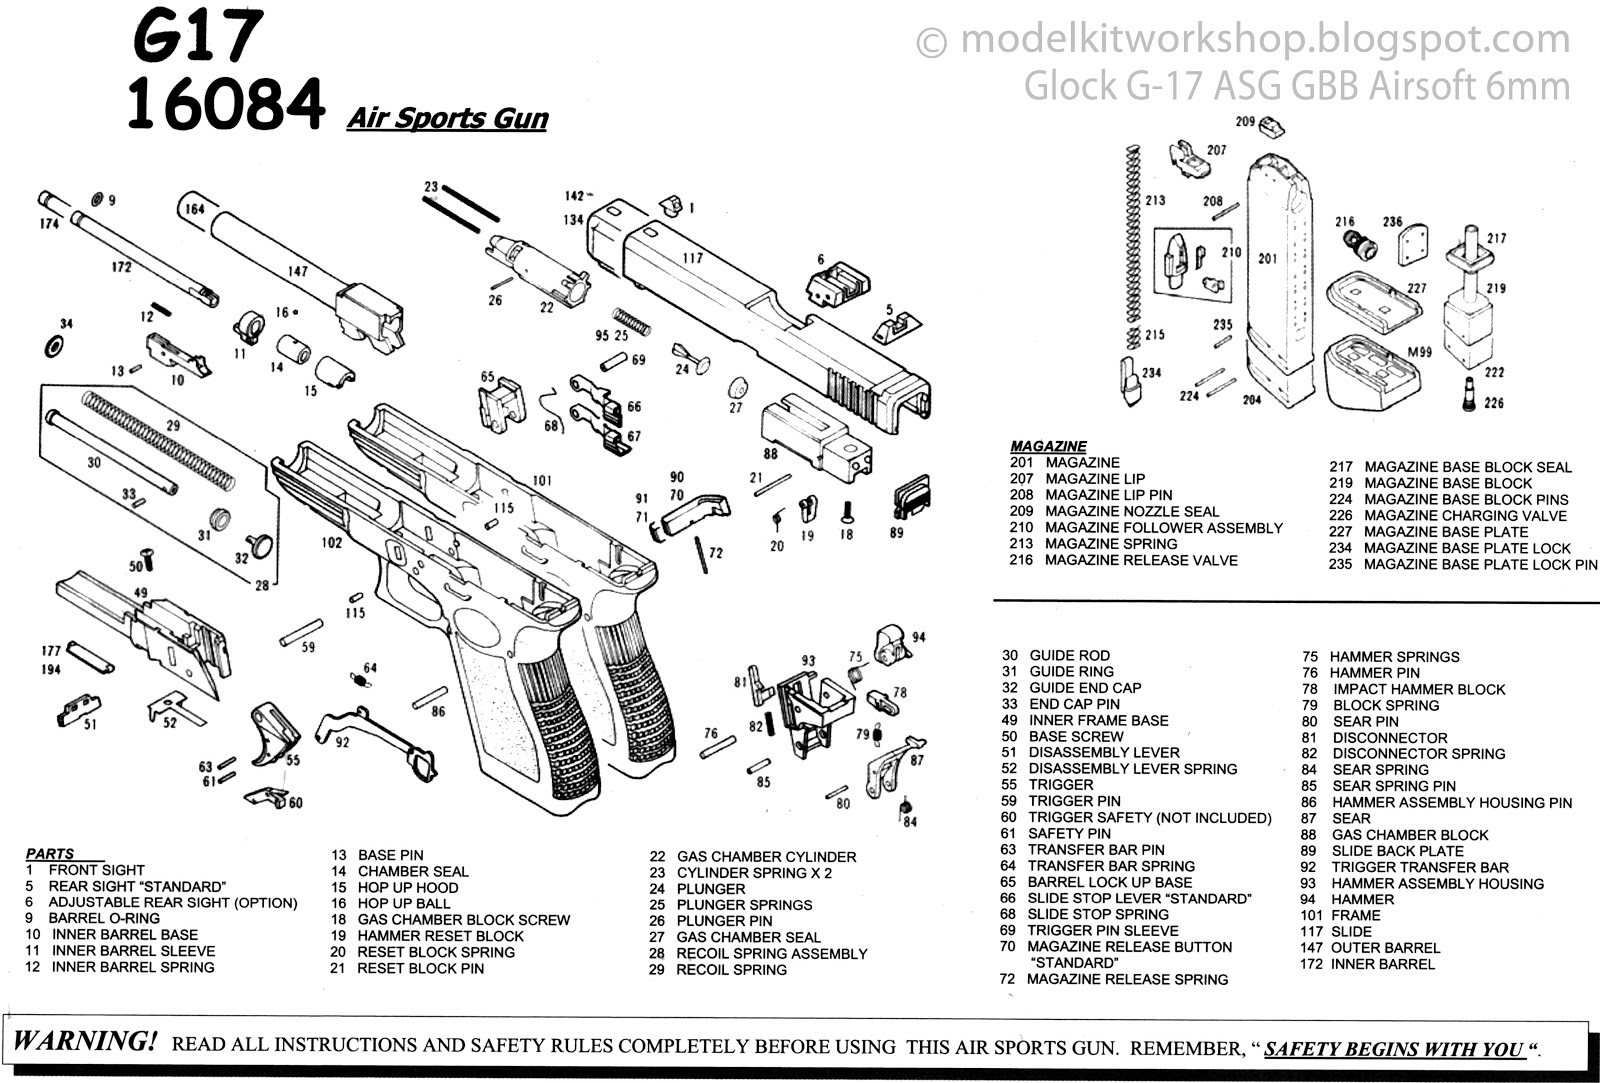 glock 26 parts diagram esp ltd ec 256 wiring 21 list pictures to pin on pinterest pinsdaddy